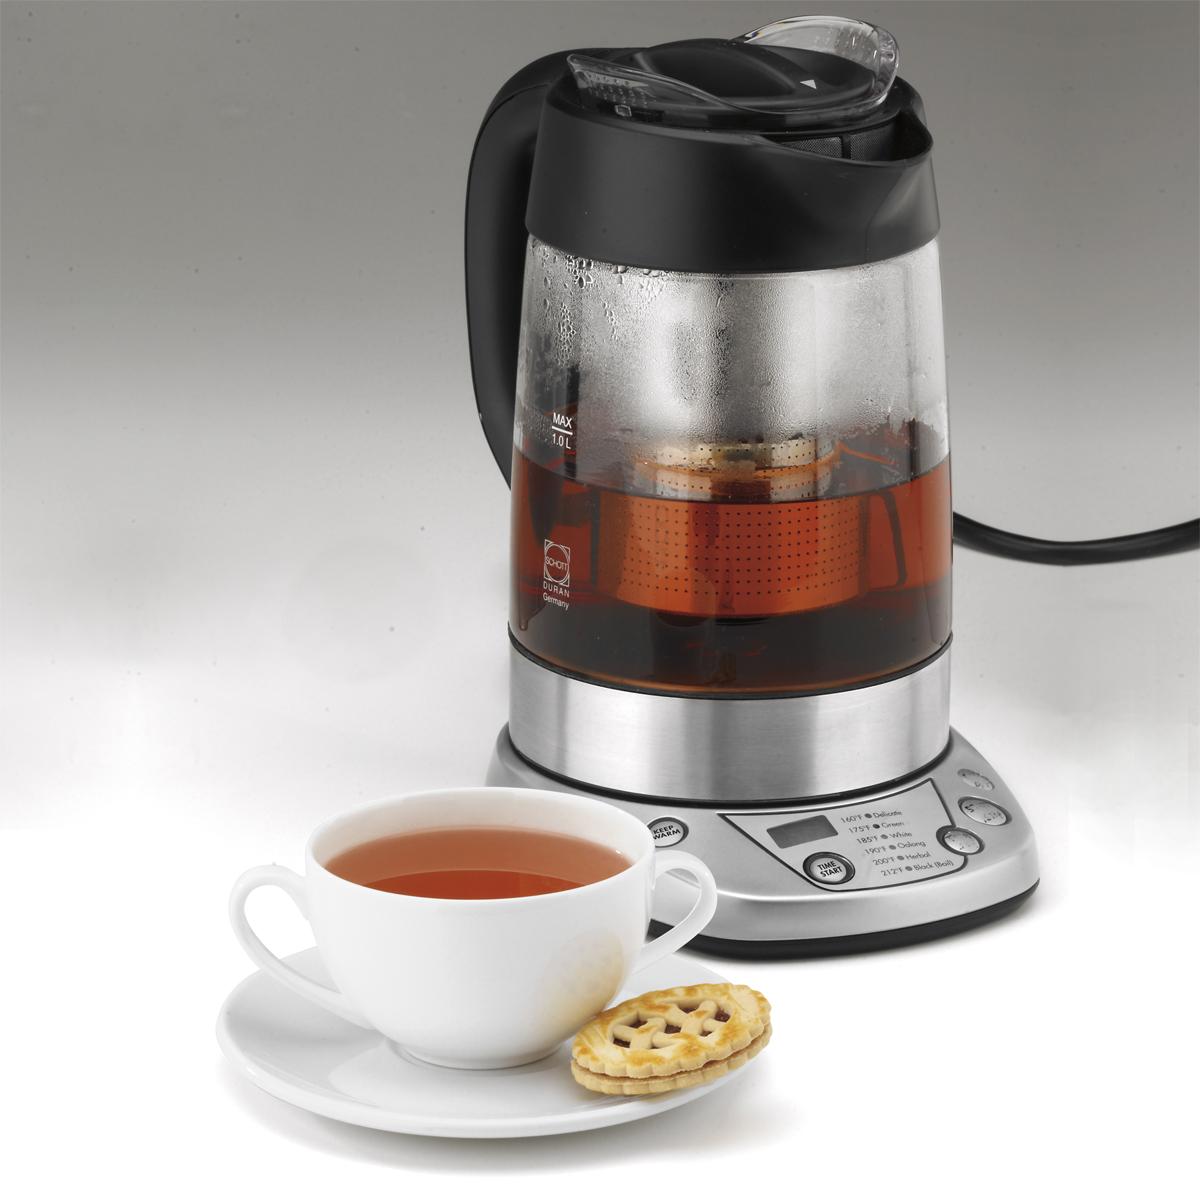 perfectemp programmable tea steeper and kettle cuisinart